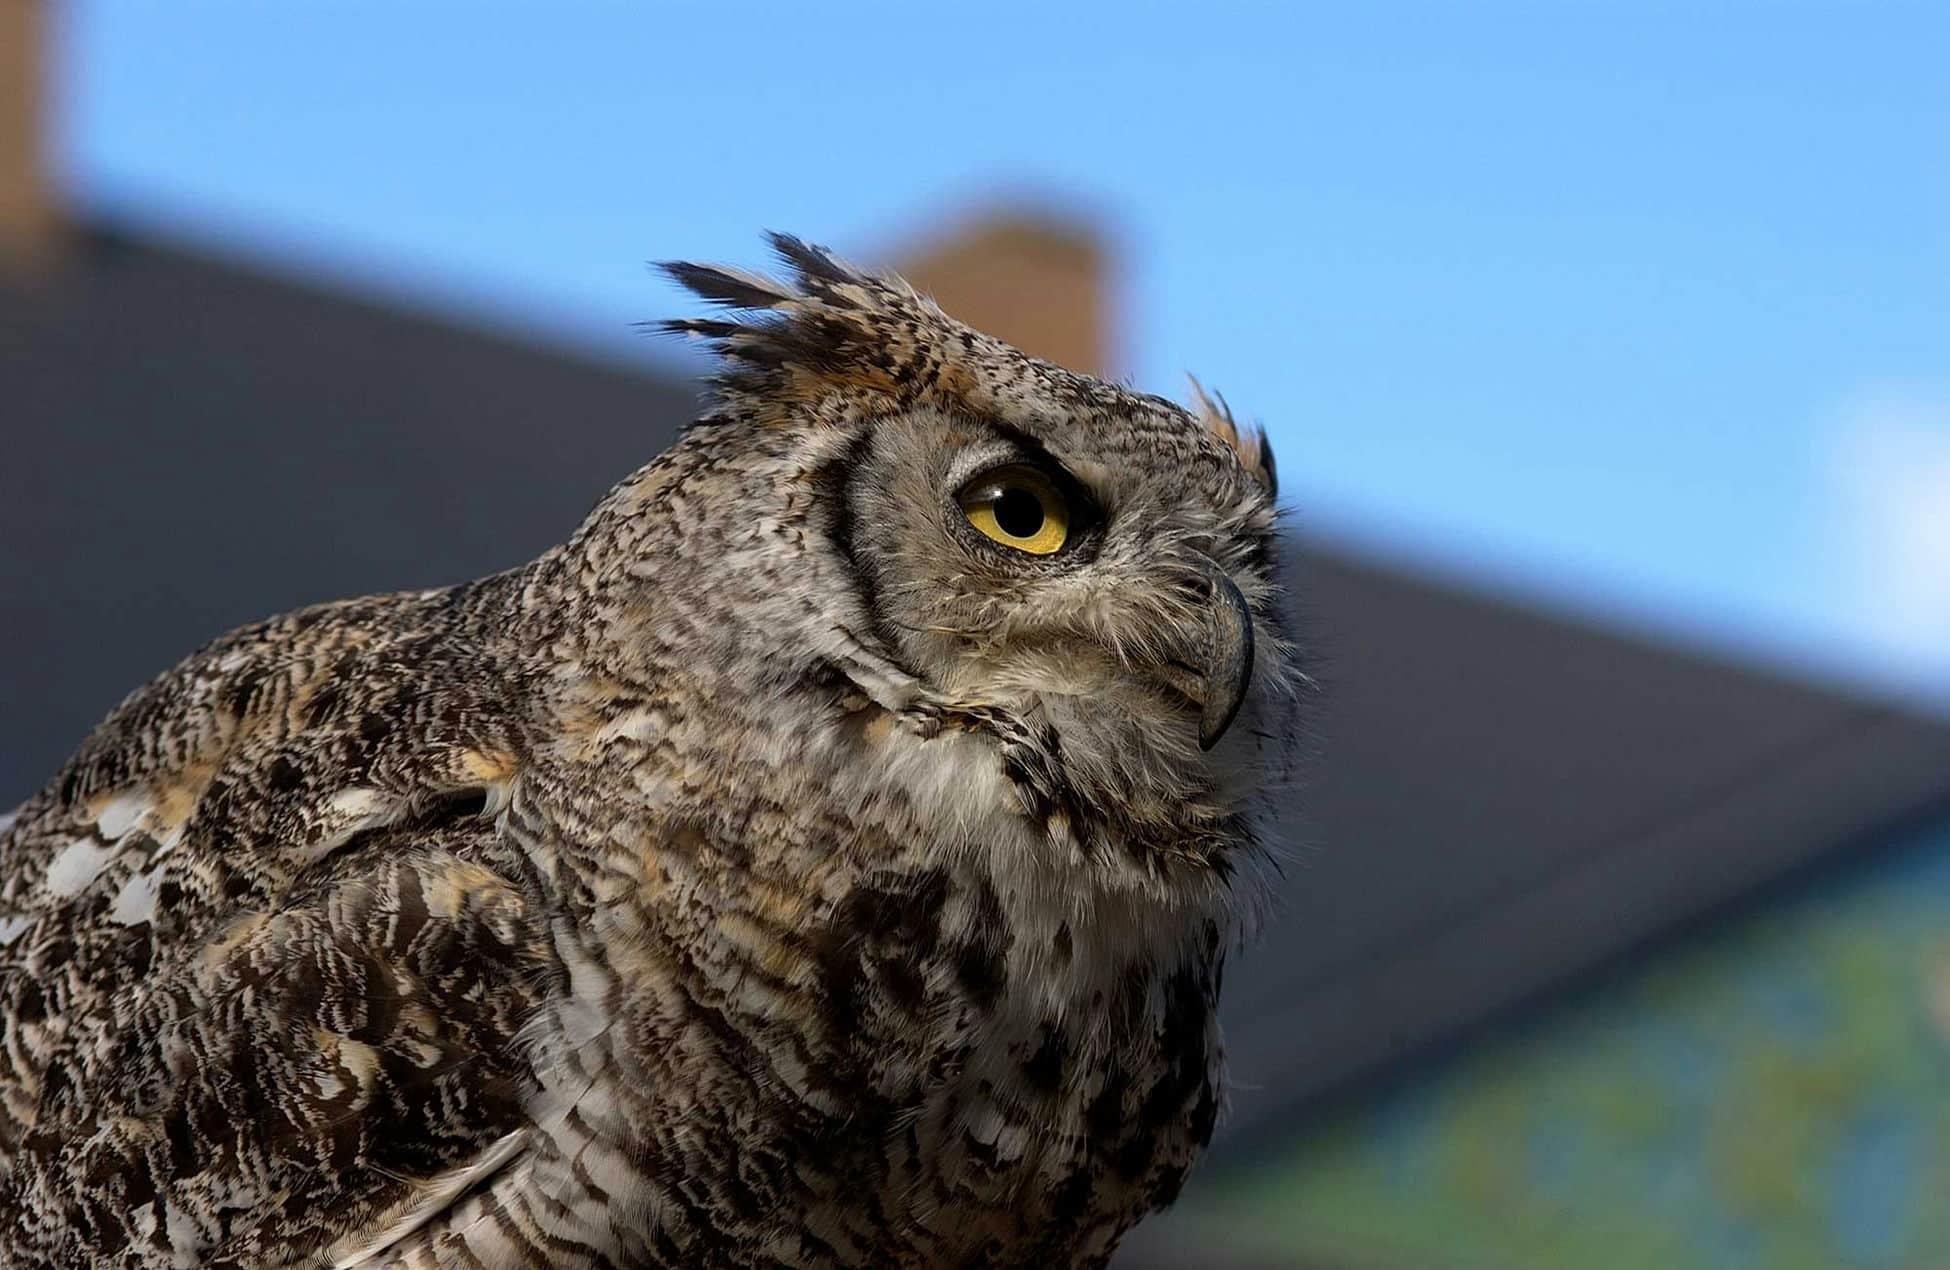 ardenne residences saint-hubert 6870 region landscapes owl